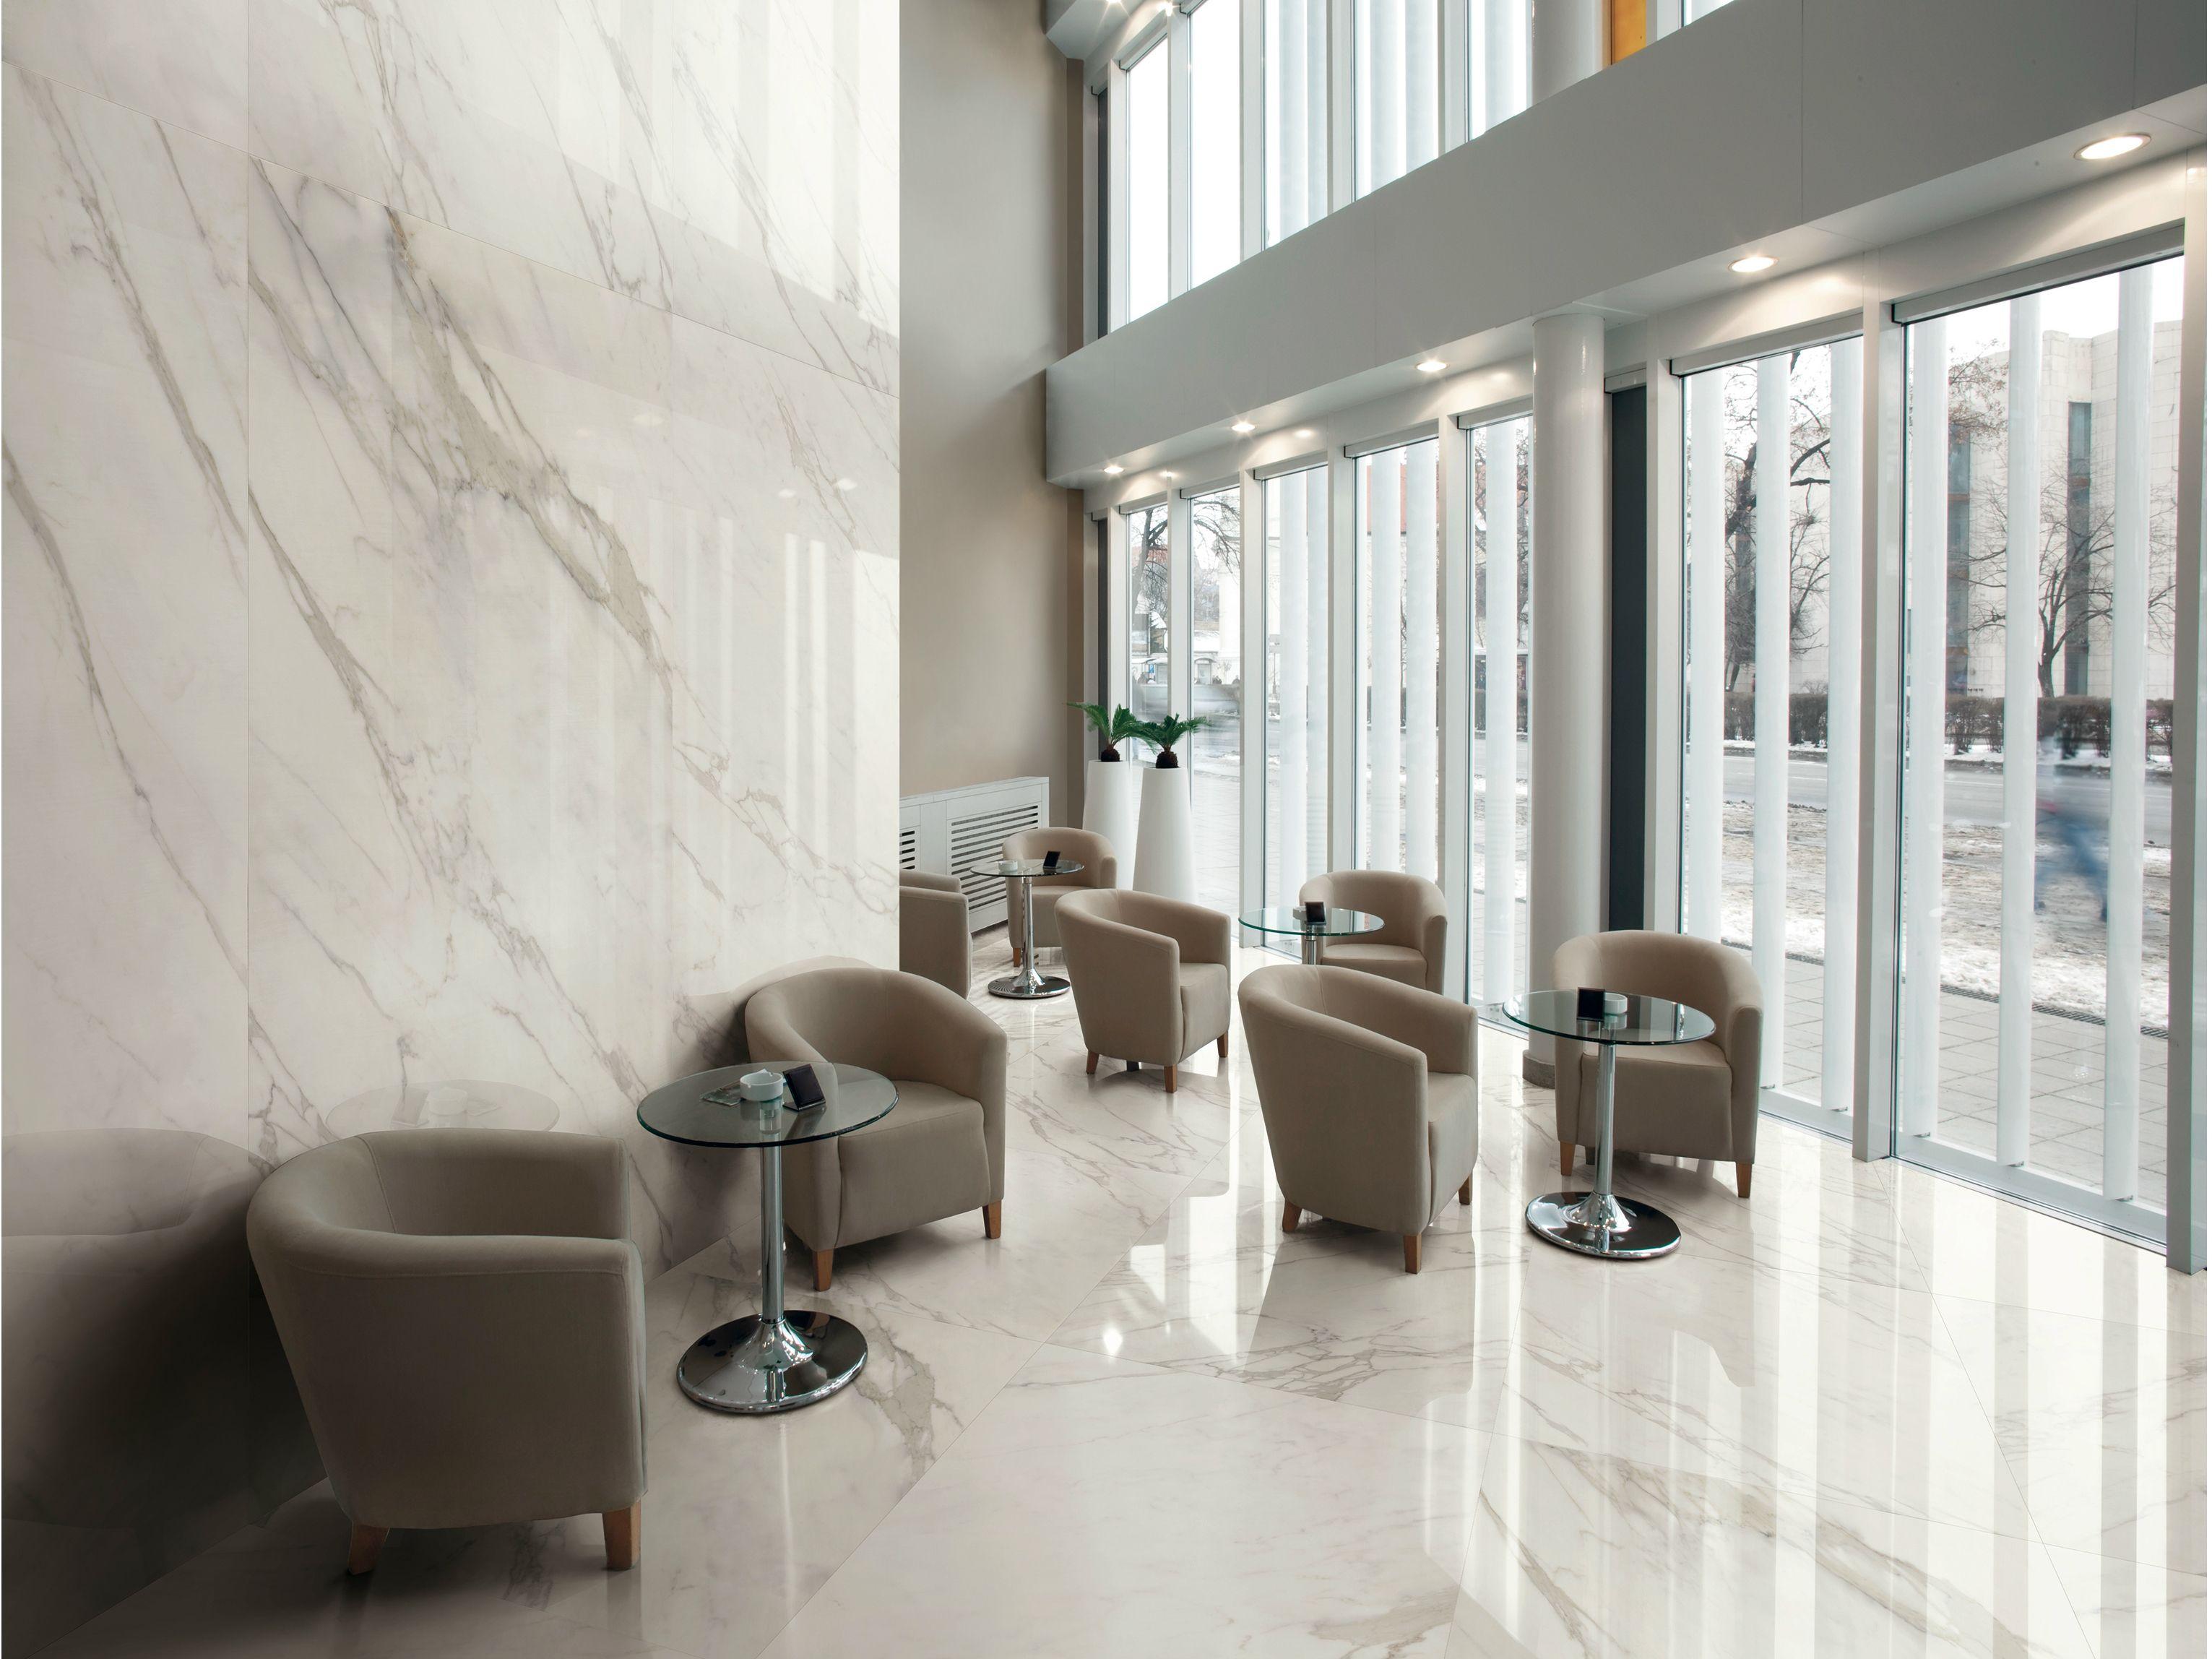 rev tement de sol mur en gr s c rame effet marbre i marmi calacatta collection i marmi by ava. Black Bedroom Furniture Sets. Home Design Ideas